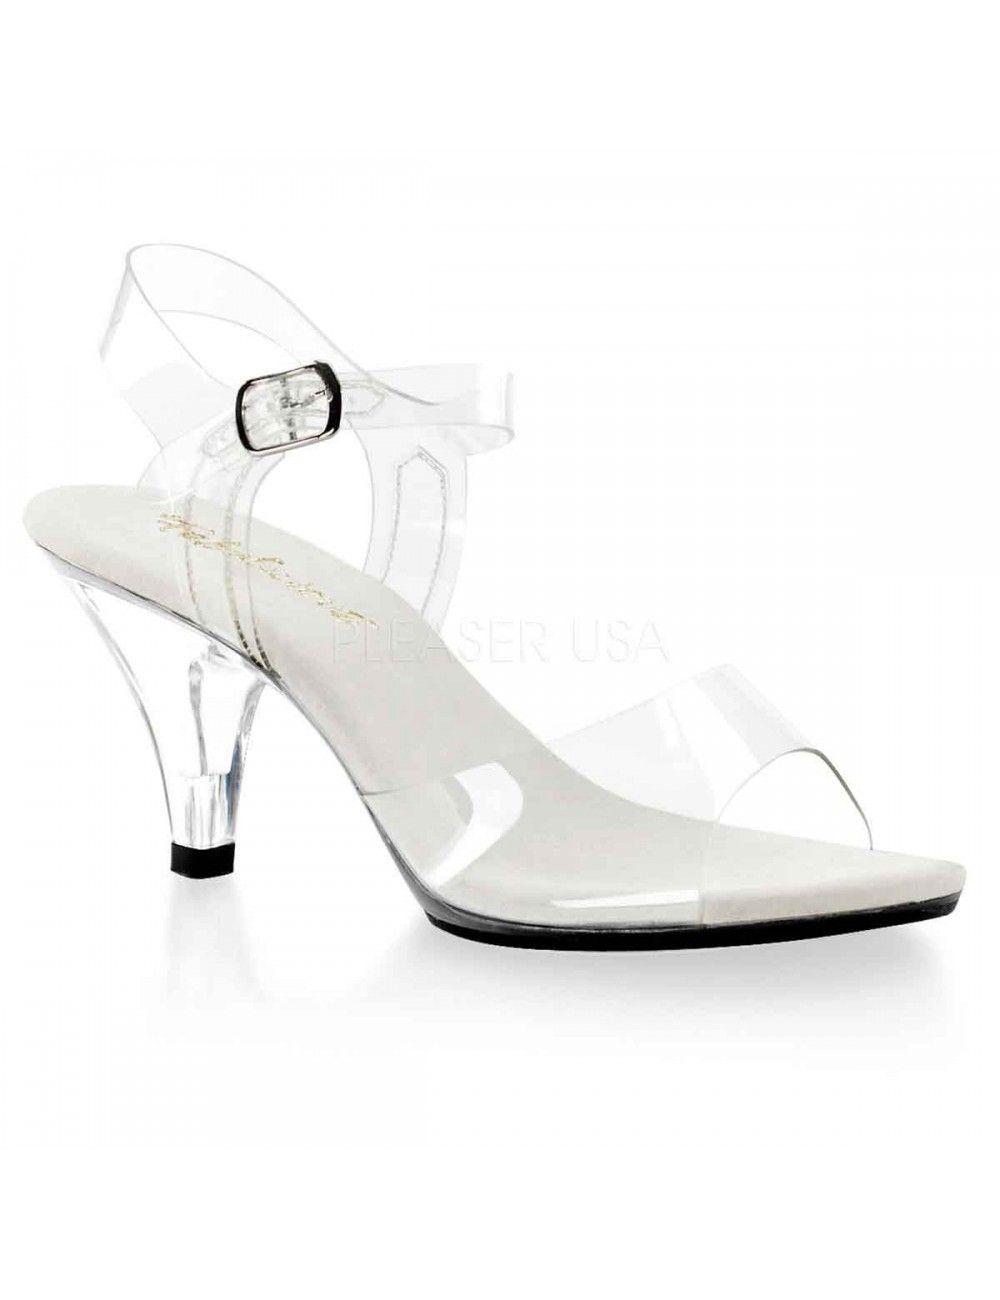 Sandales Transparentes Belle & Chic PLEASER